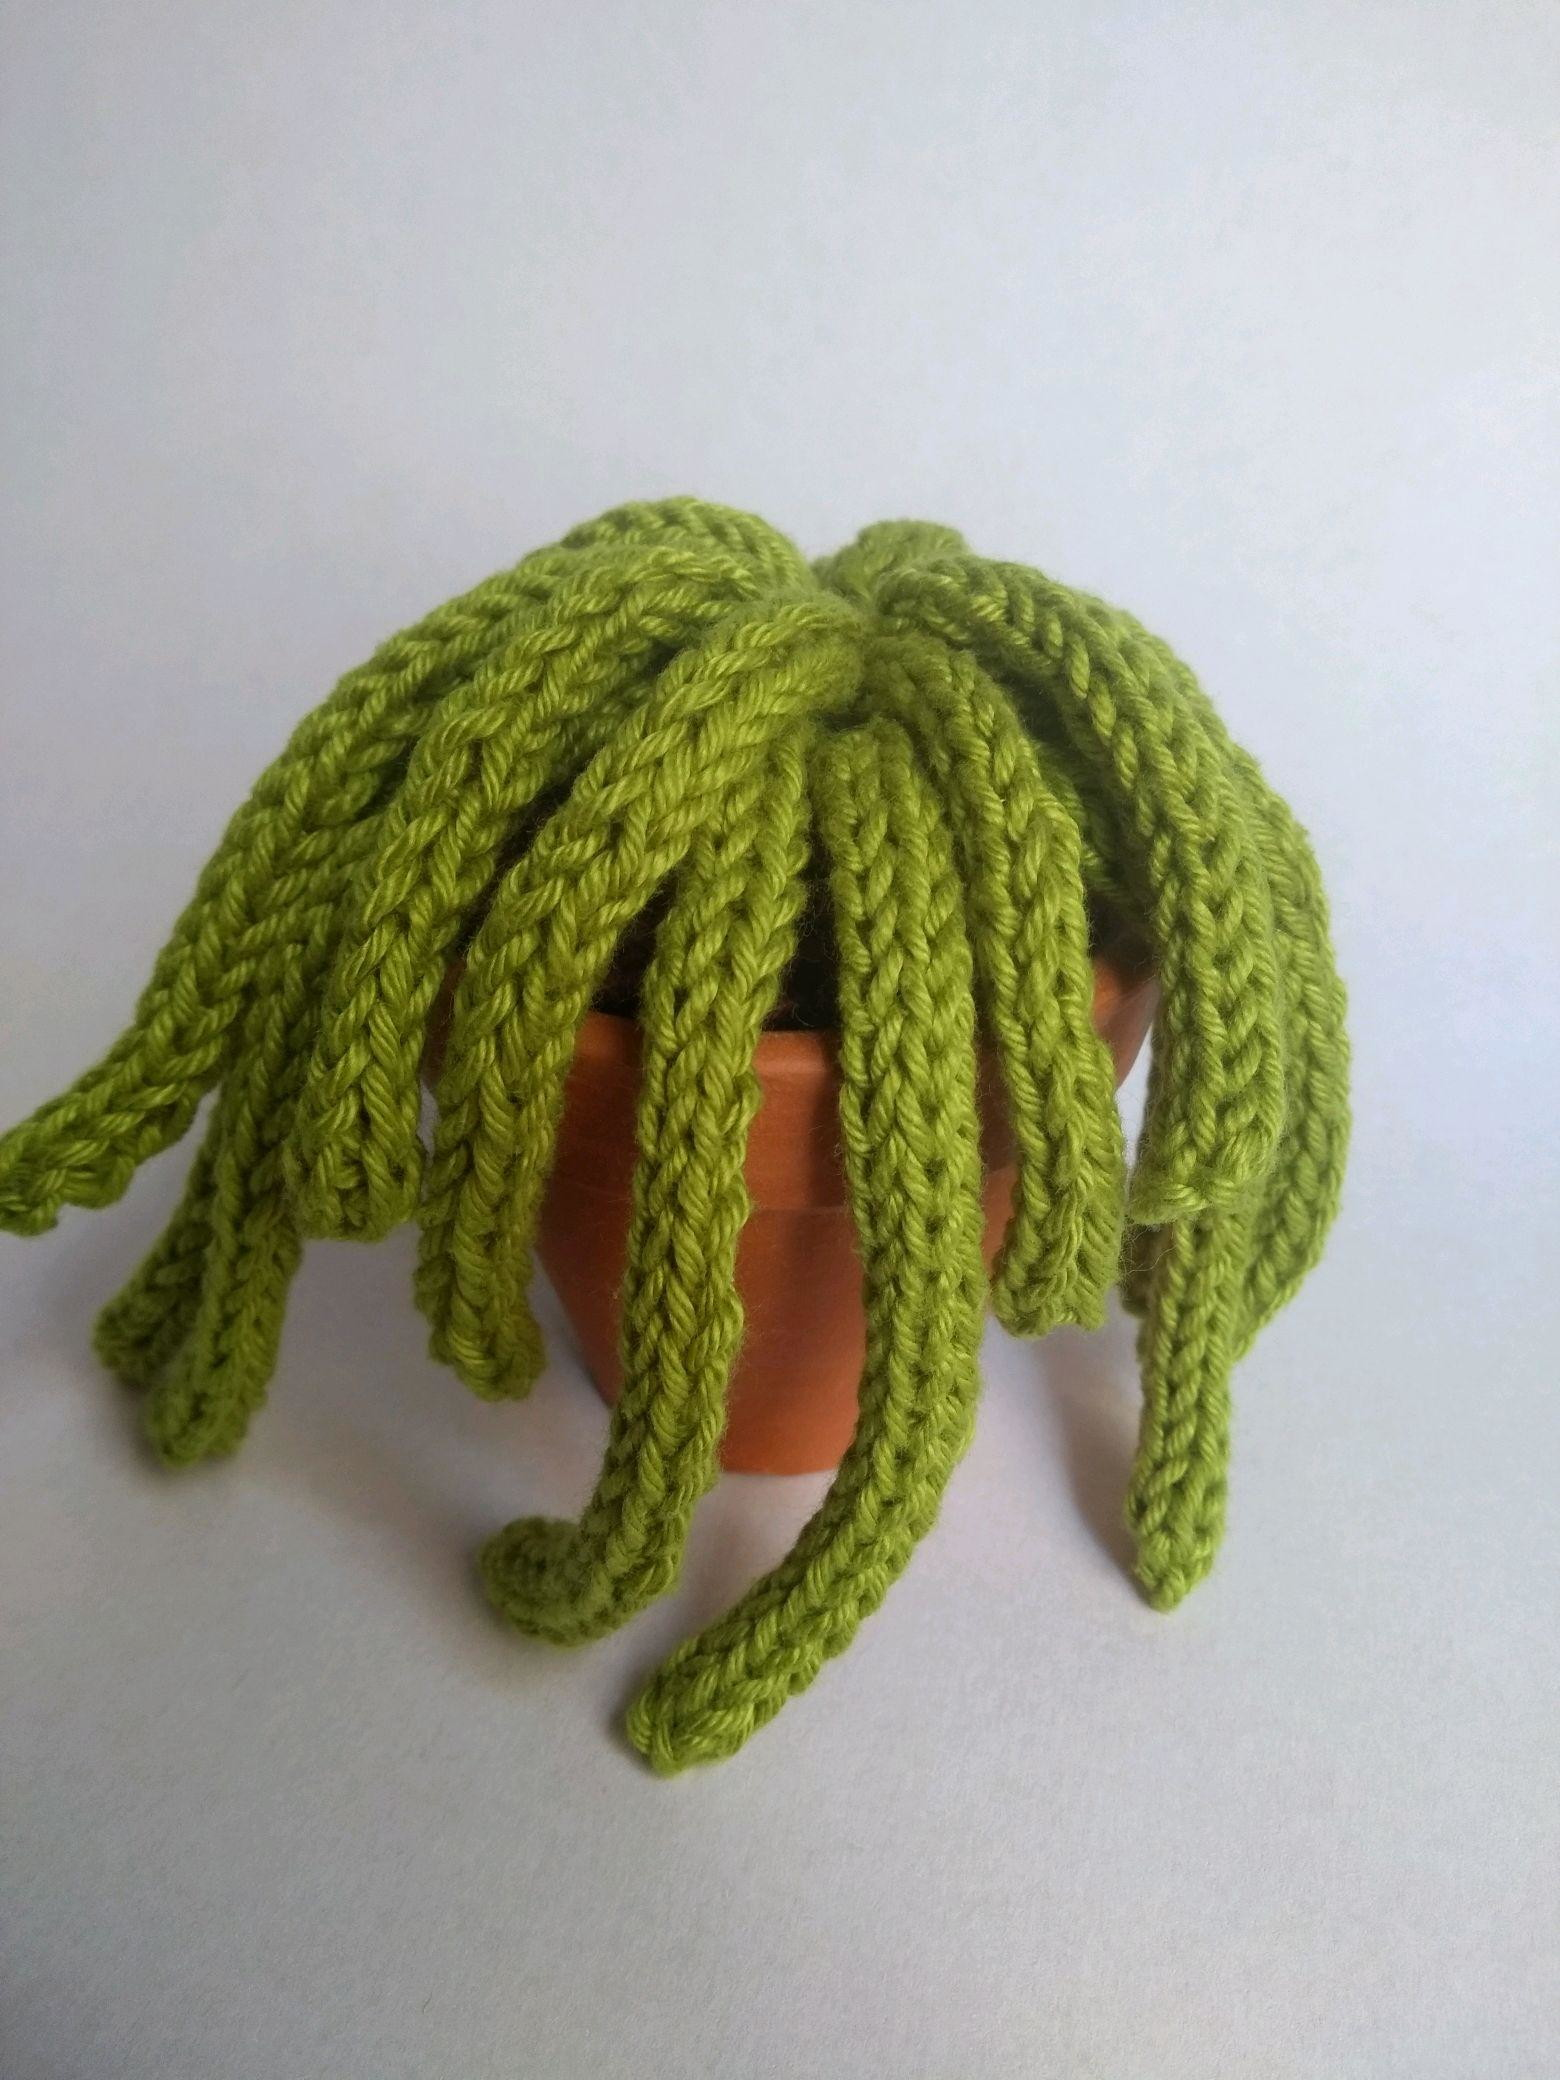 Free Crochet Pattern: Cactus Amigurumi Amore by Crochelandia   2080x1560